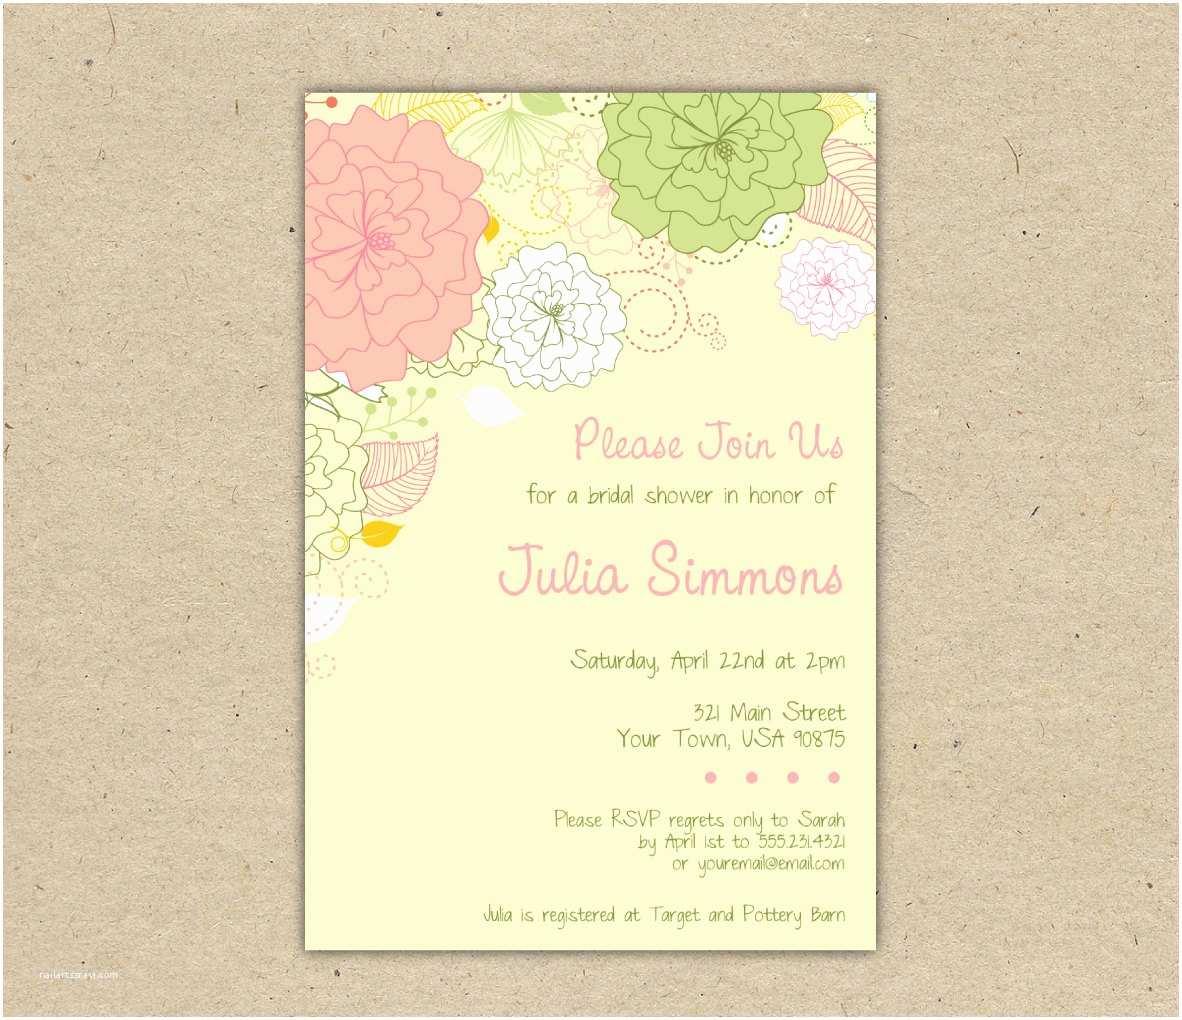 Free Bridal Shower Invitation Templates Free Wedding Shower Invitation Templates Weddingwoow